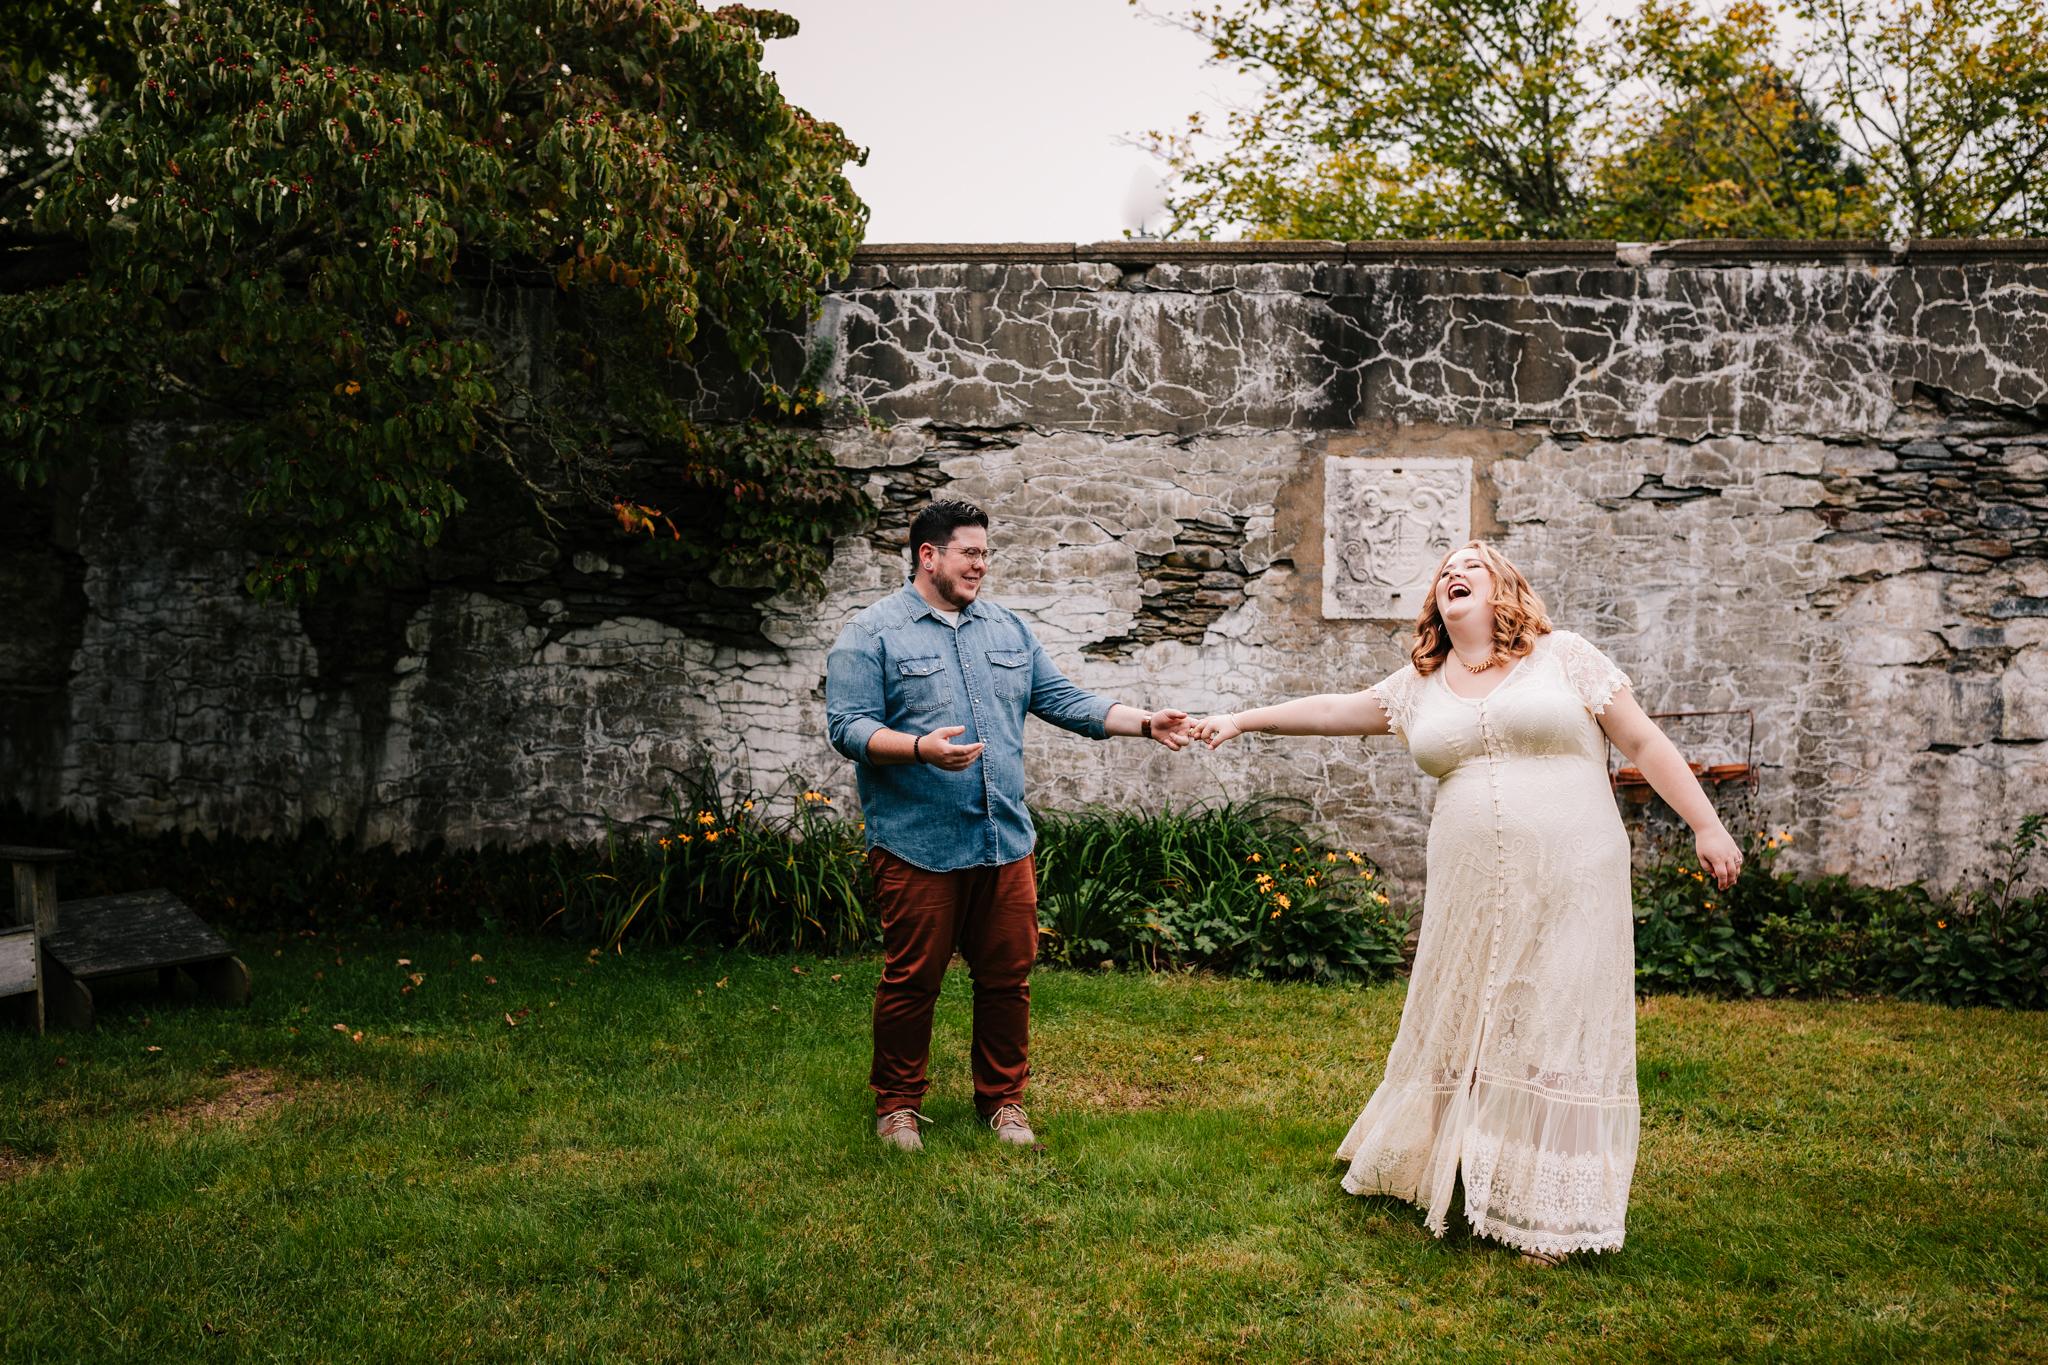 southwest-albuquerque-phoenix-engagement-photographer-gwyn-careg-inn-weddings-andrea-van-orsouw-photography-1.jpg